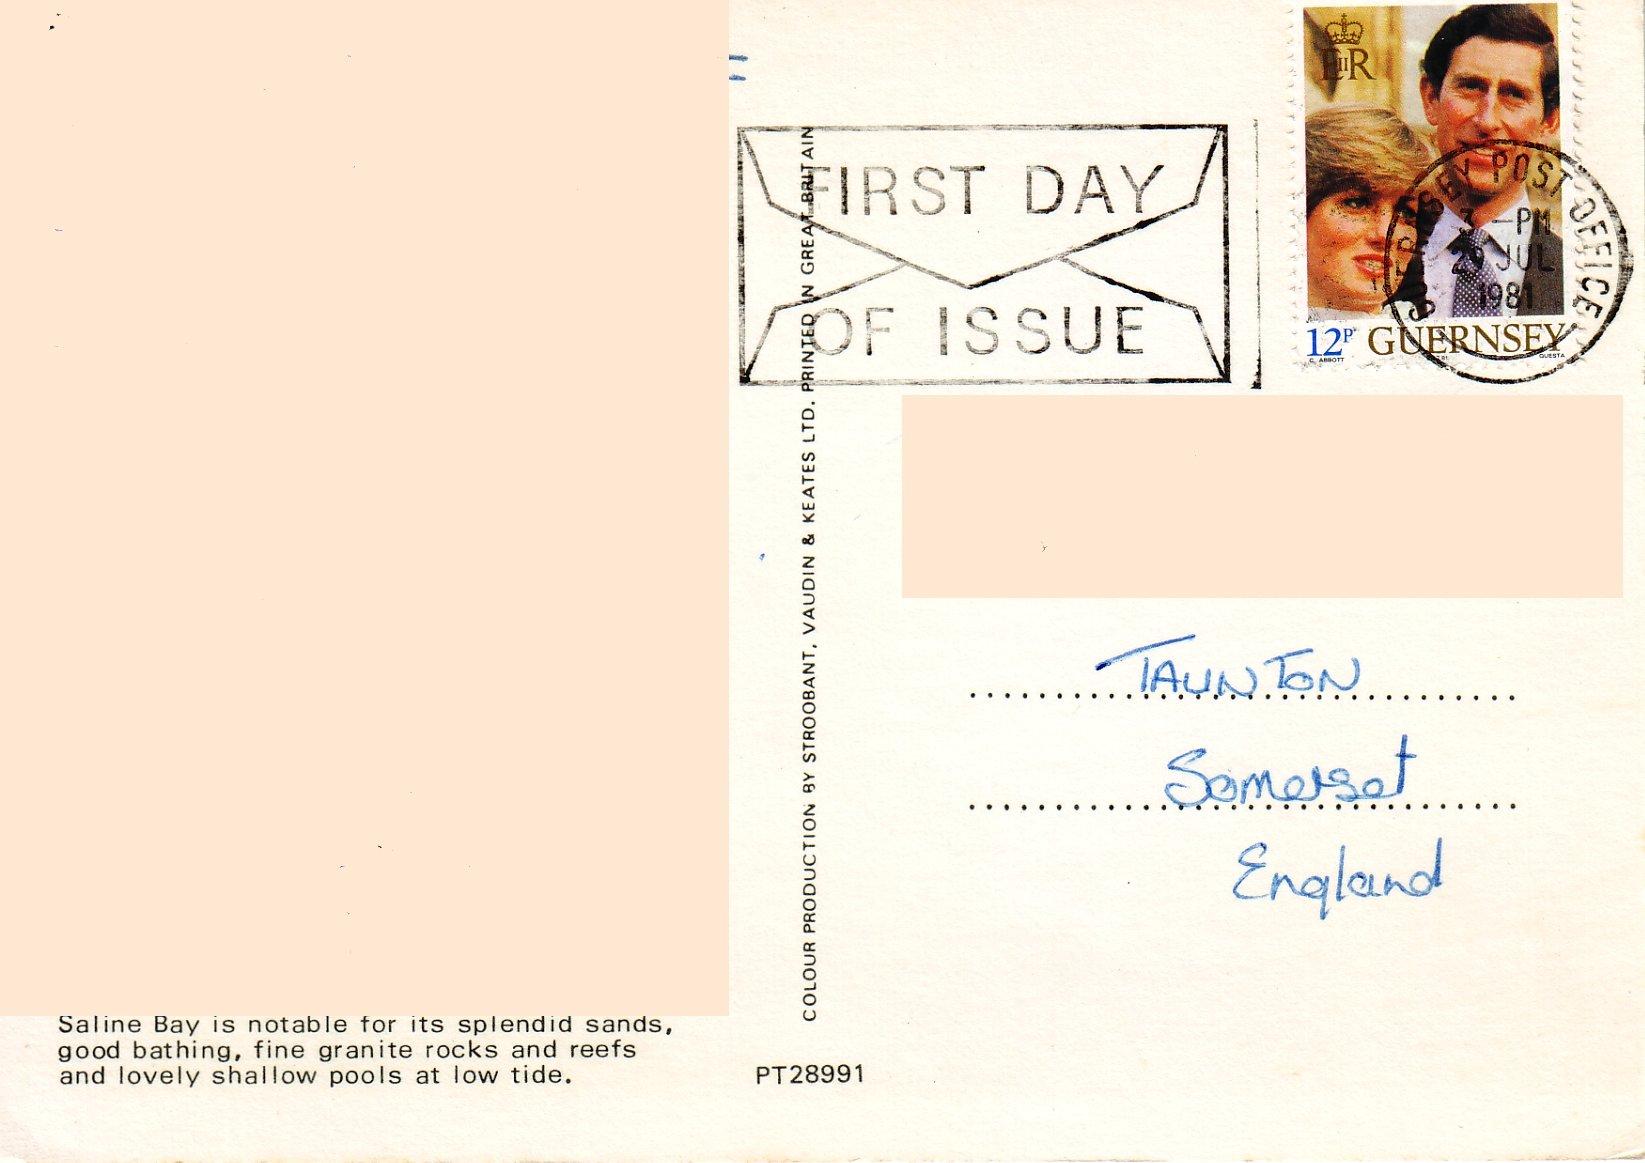 Charles & Diana Wedding Stamp - Guernsey